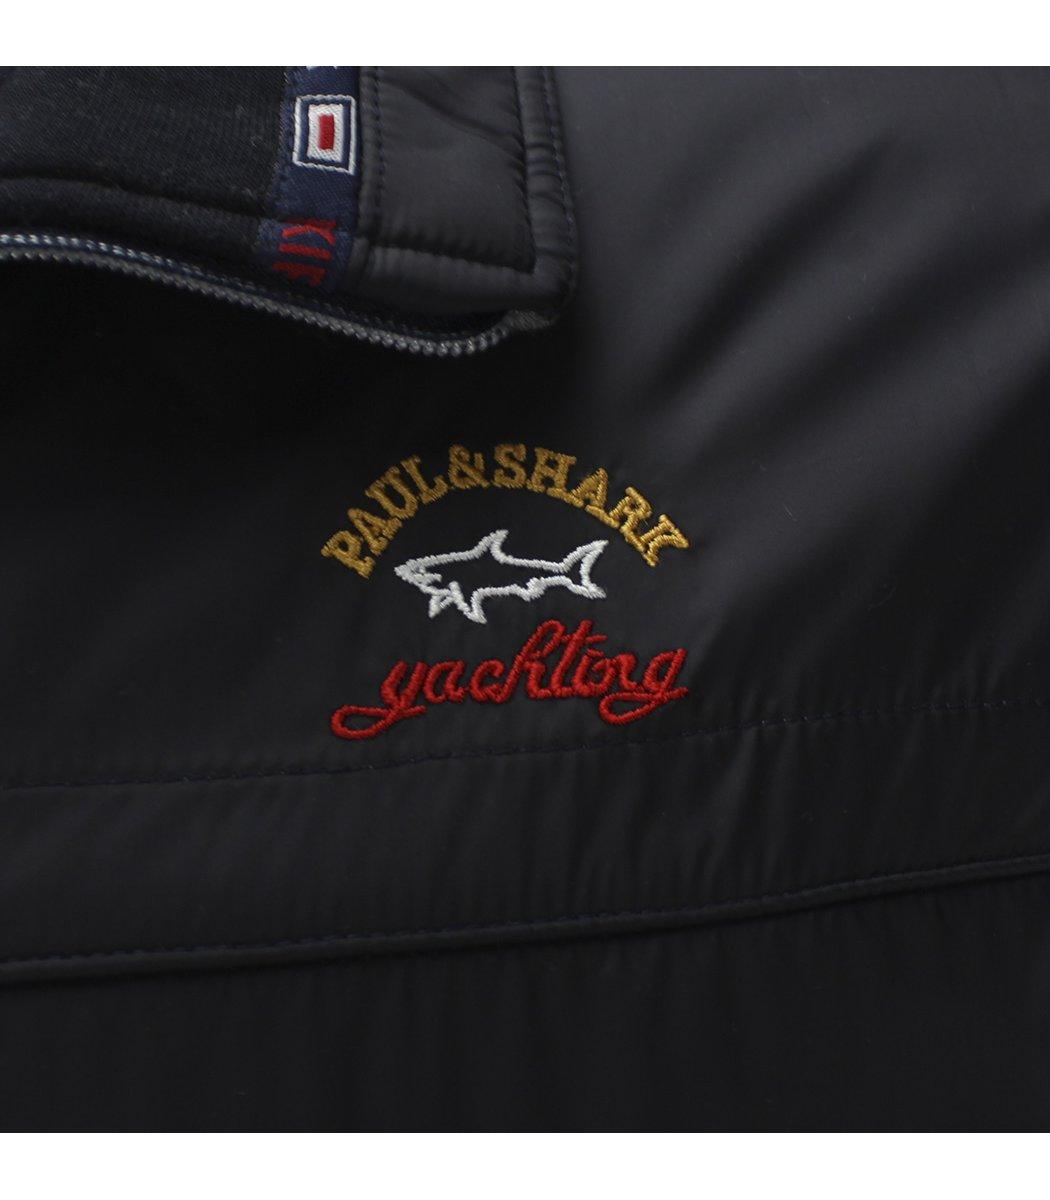 Утепленный серый спортивный костюм Paul&Shark 1481